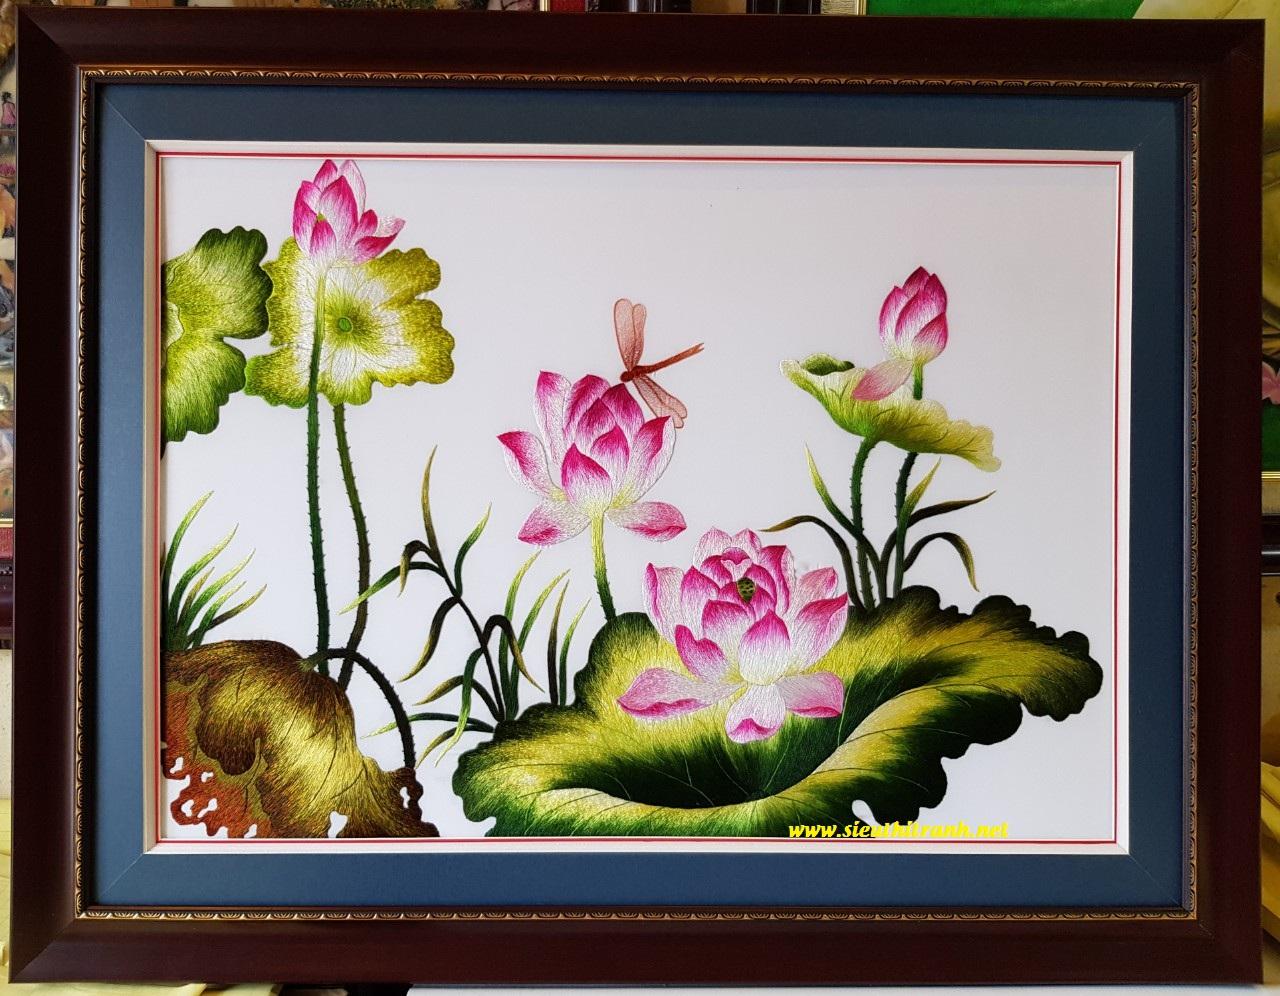 Hoa sen, tranh thêu tay -T356